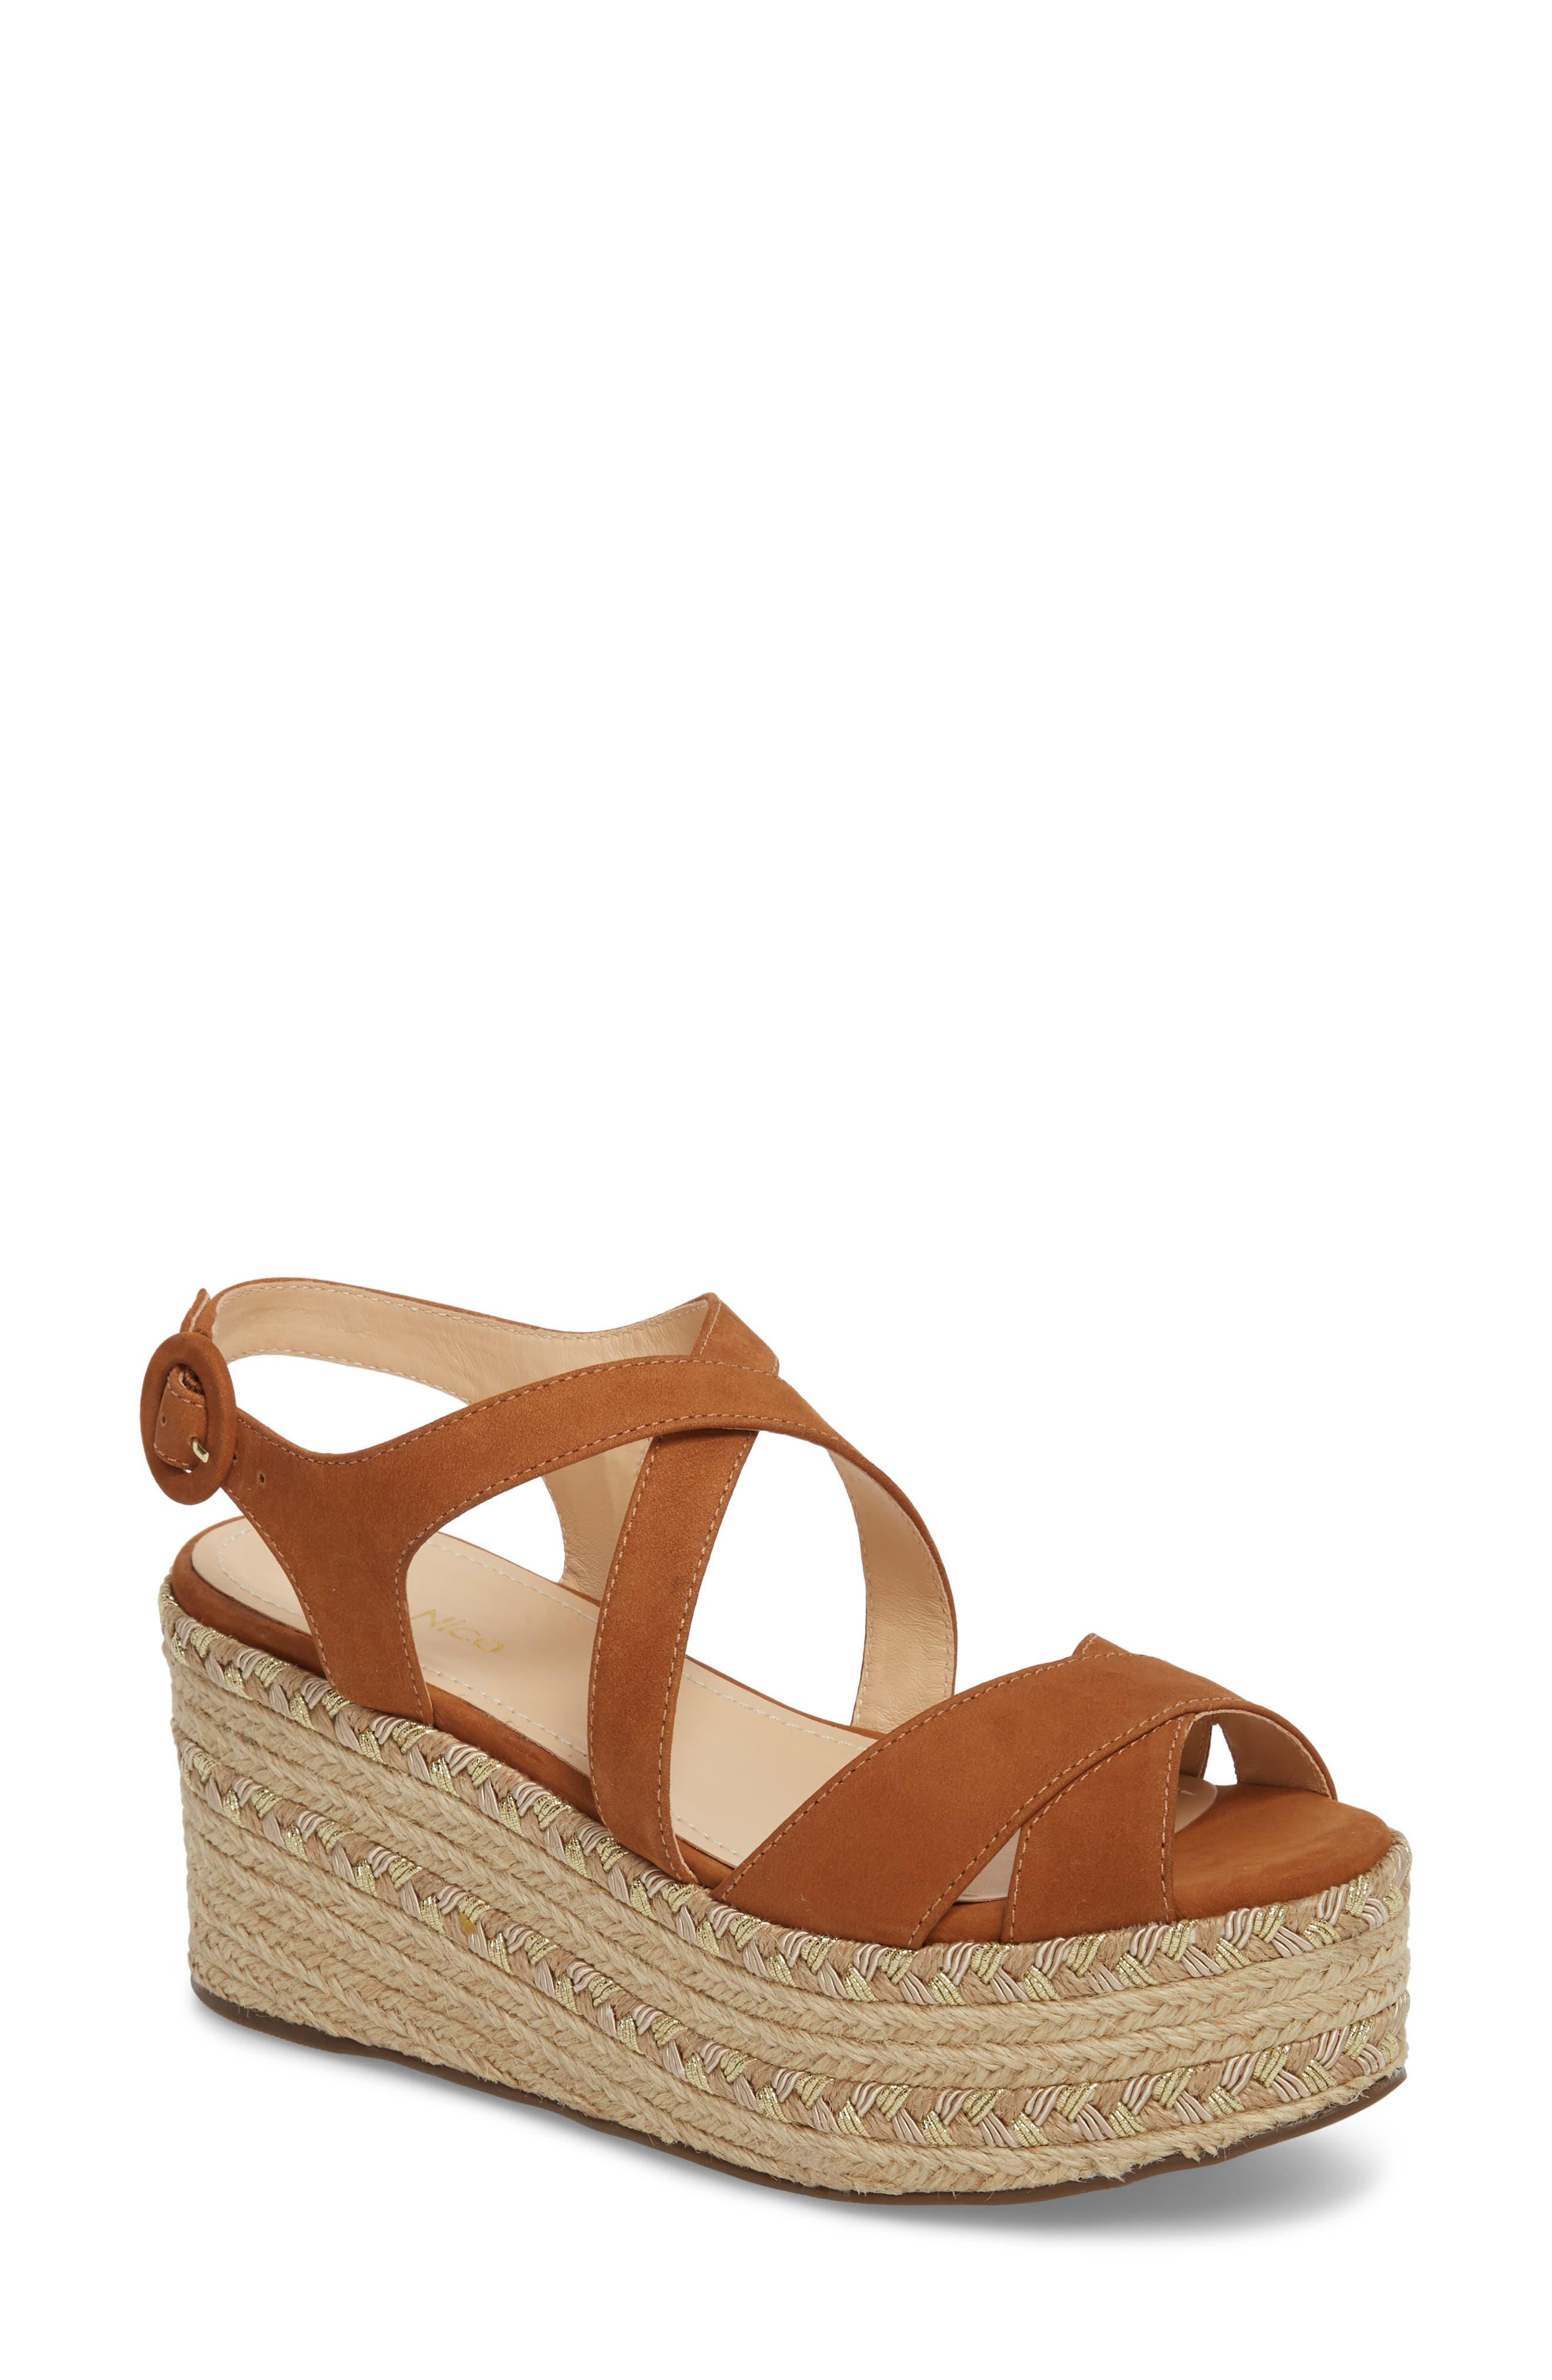 Vikki Espadrille Platform Sandal,                             Main thumbnail 1, color,                             Tan Leather